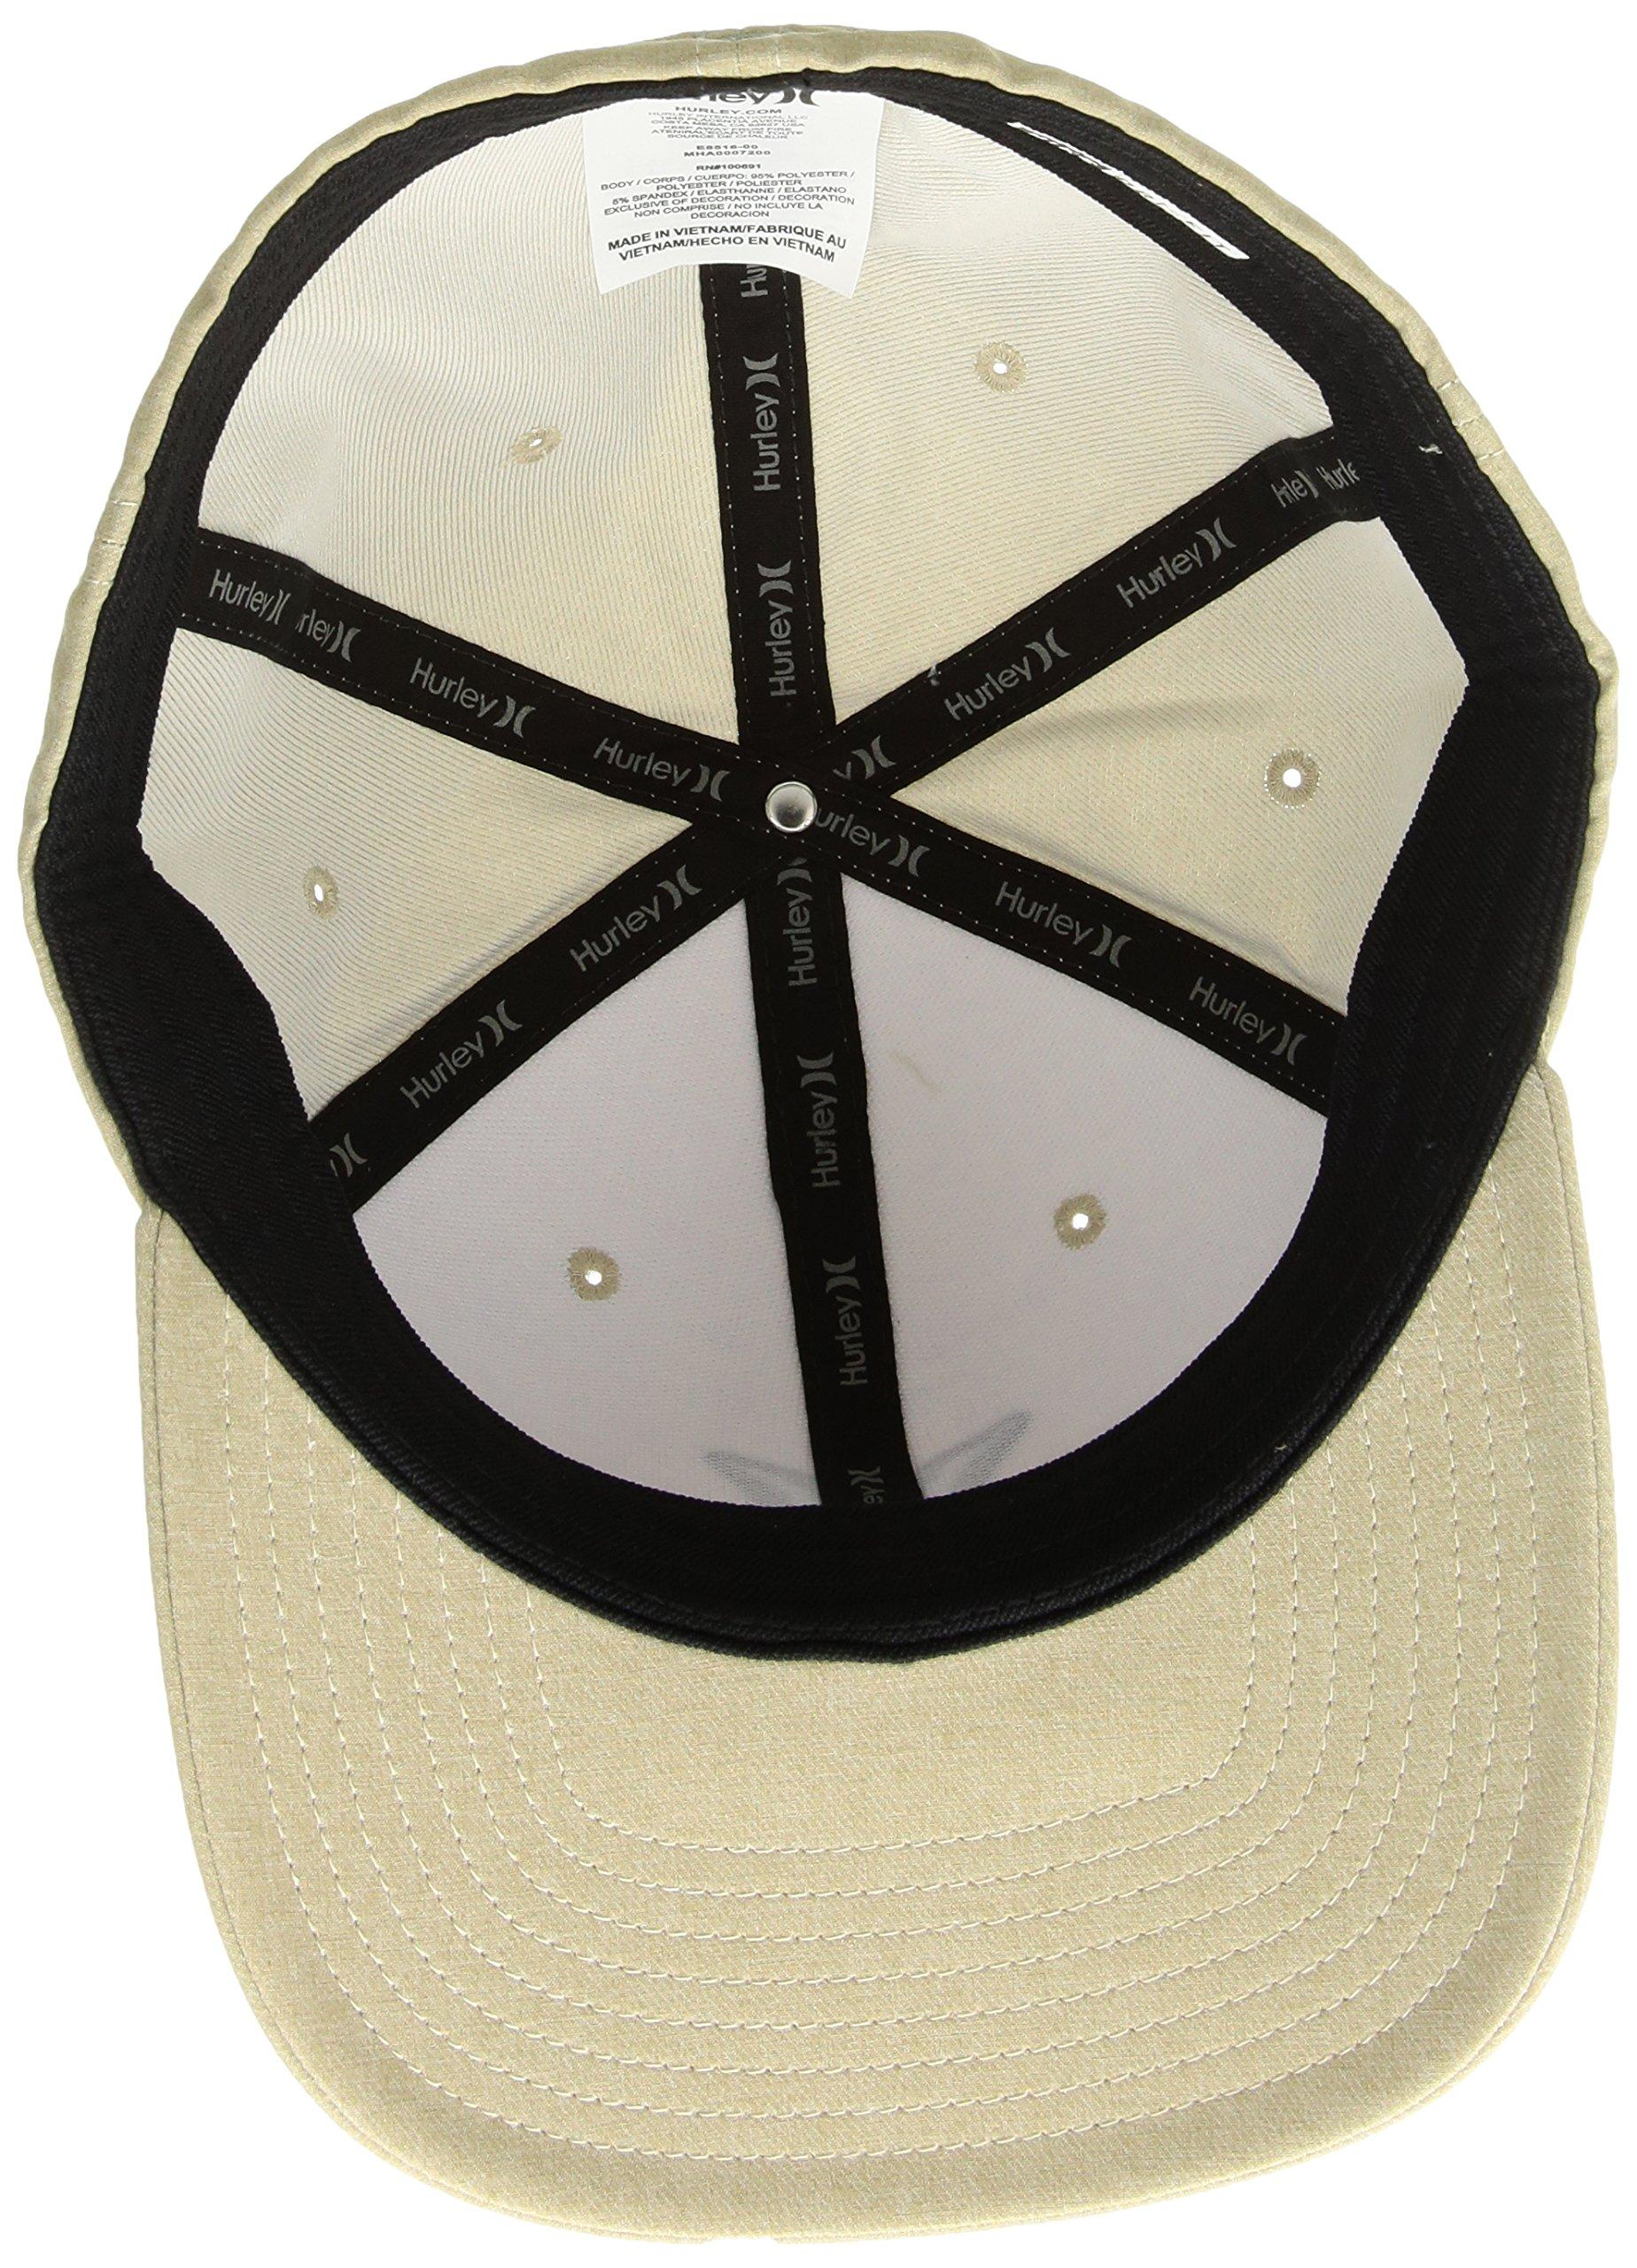 42f0d4ac1b4 Hurley Dri-Fit Heather Hat - Khaki - S M - MHA0007200-26B   Hats   Caps    Clothing